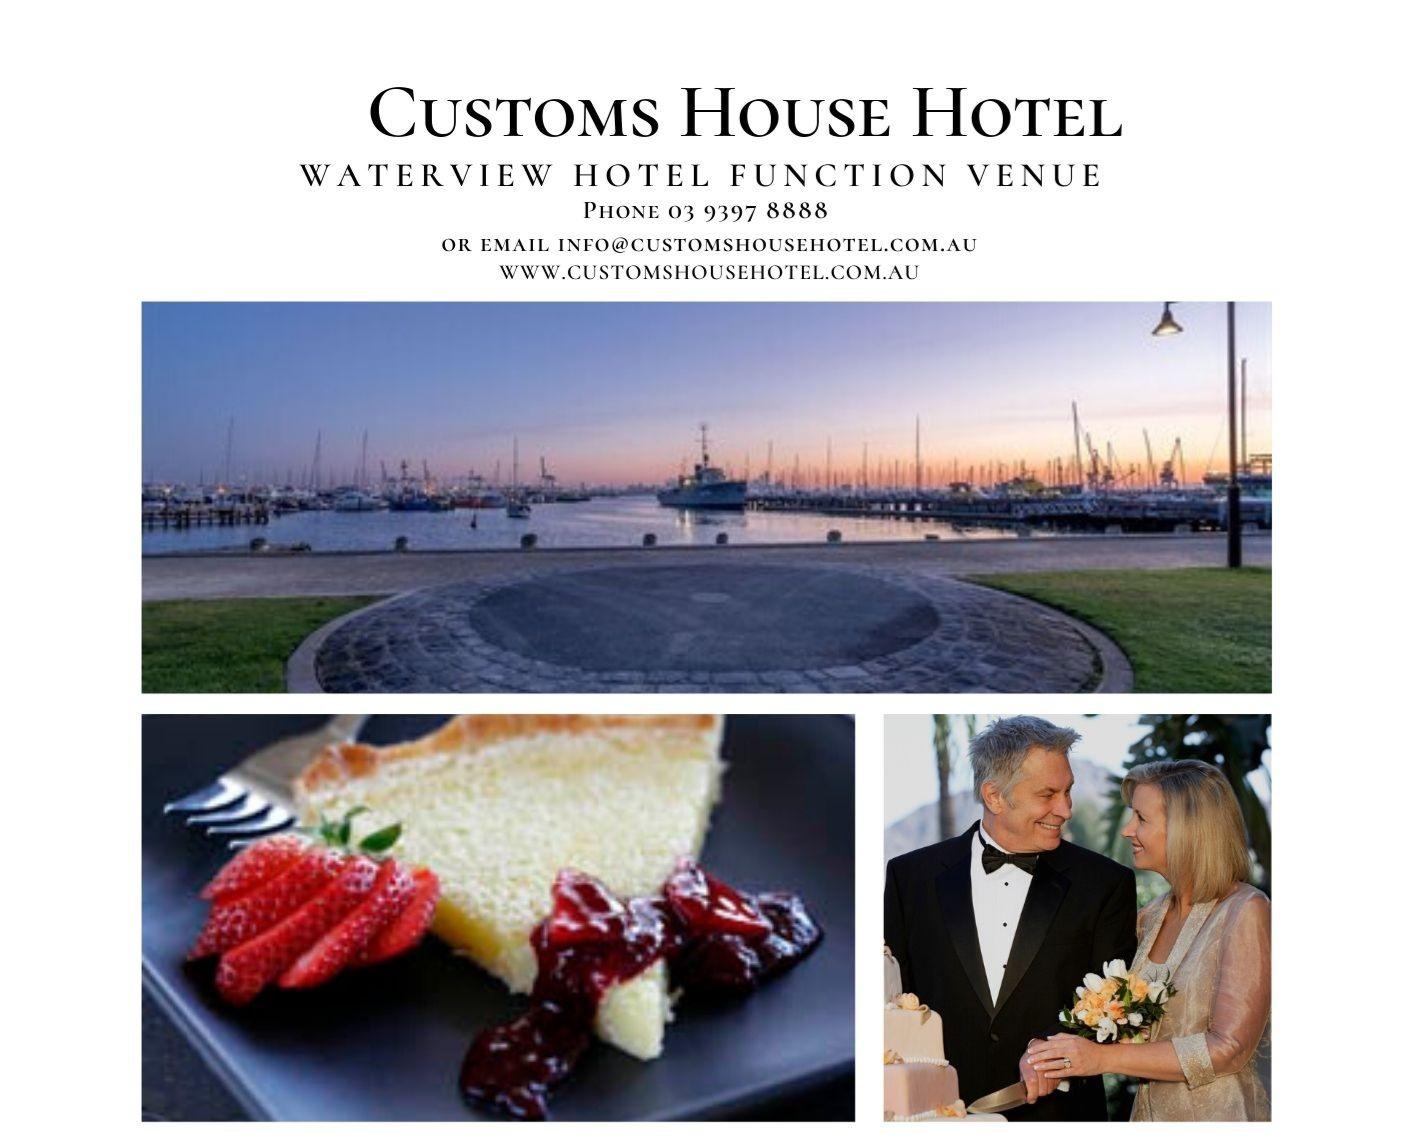 Customs House Hotel